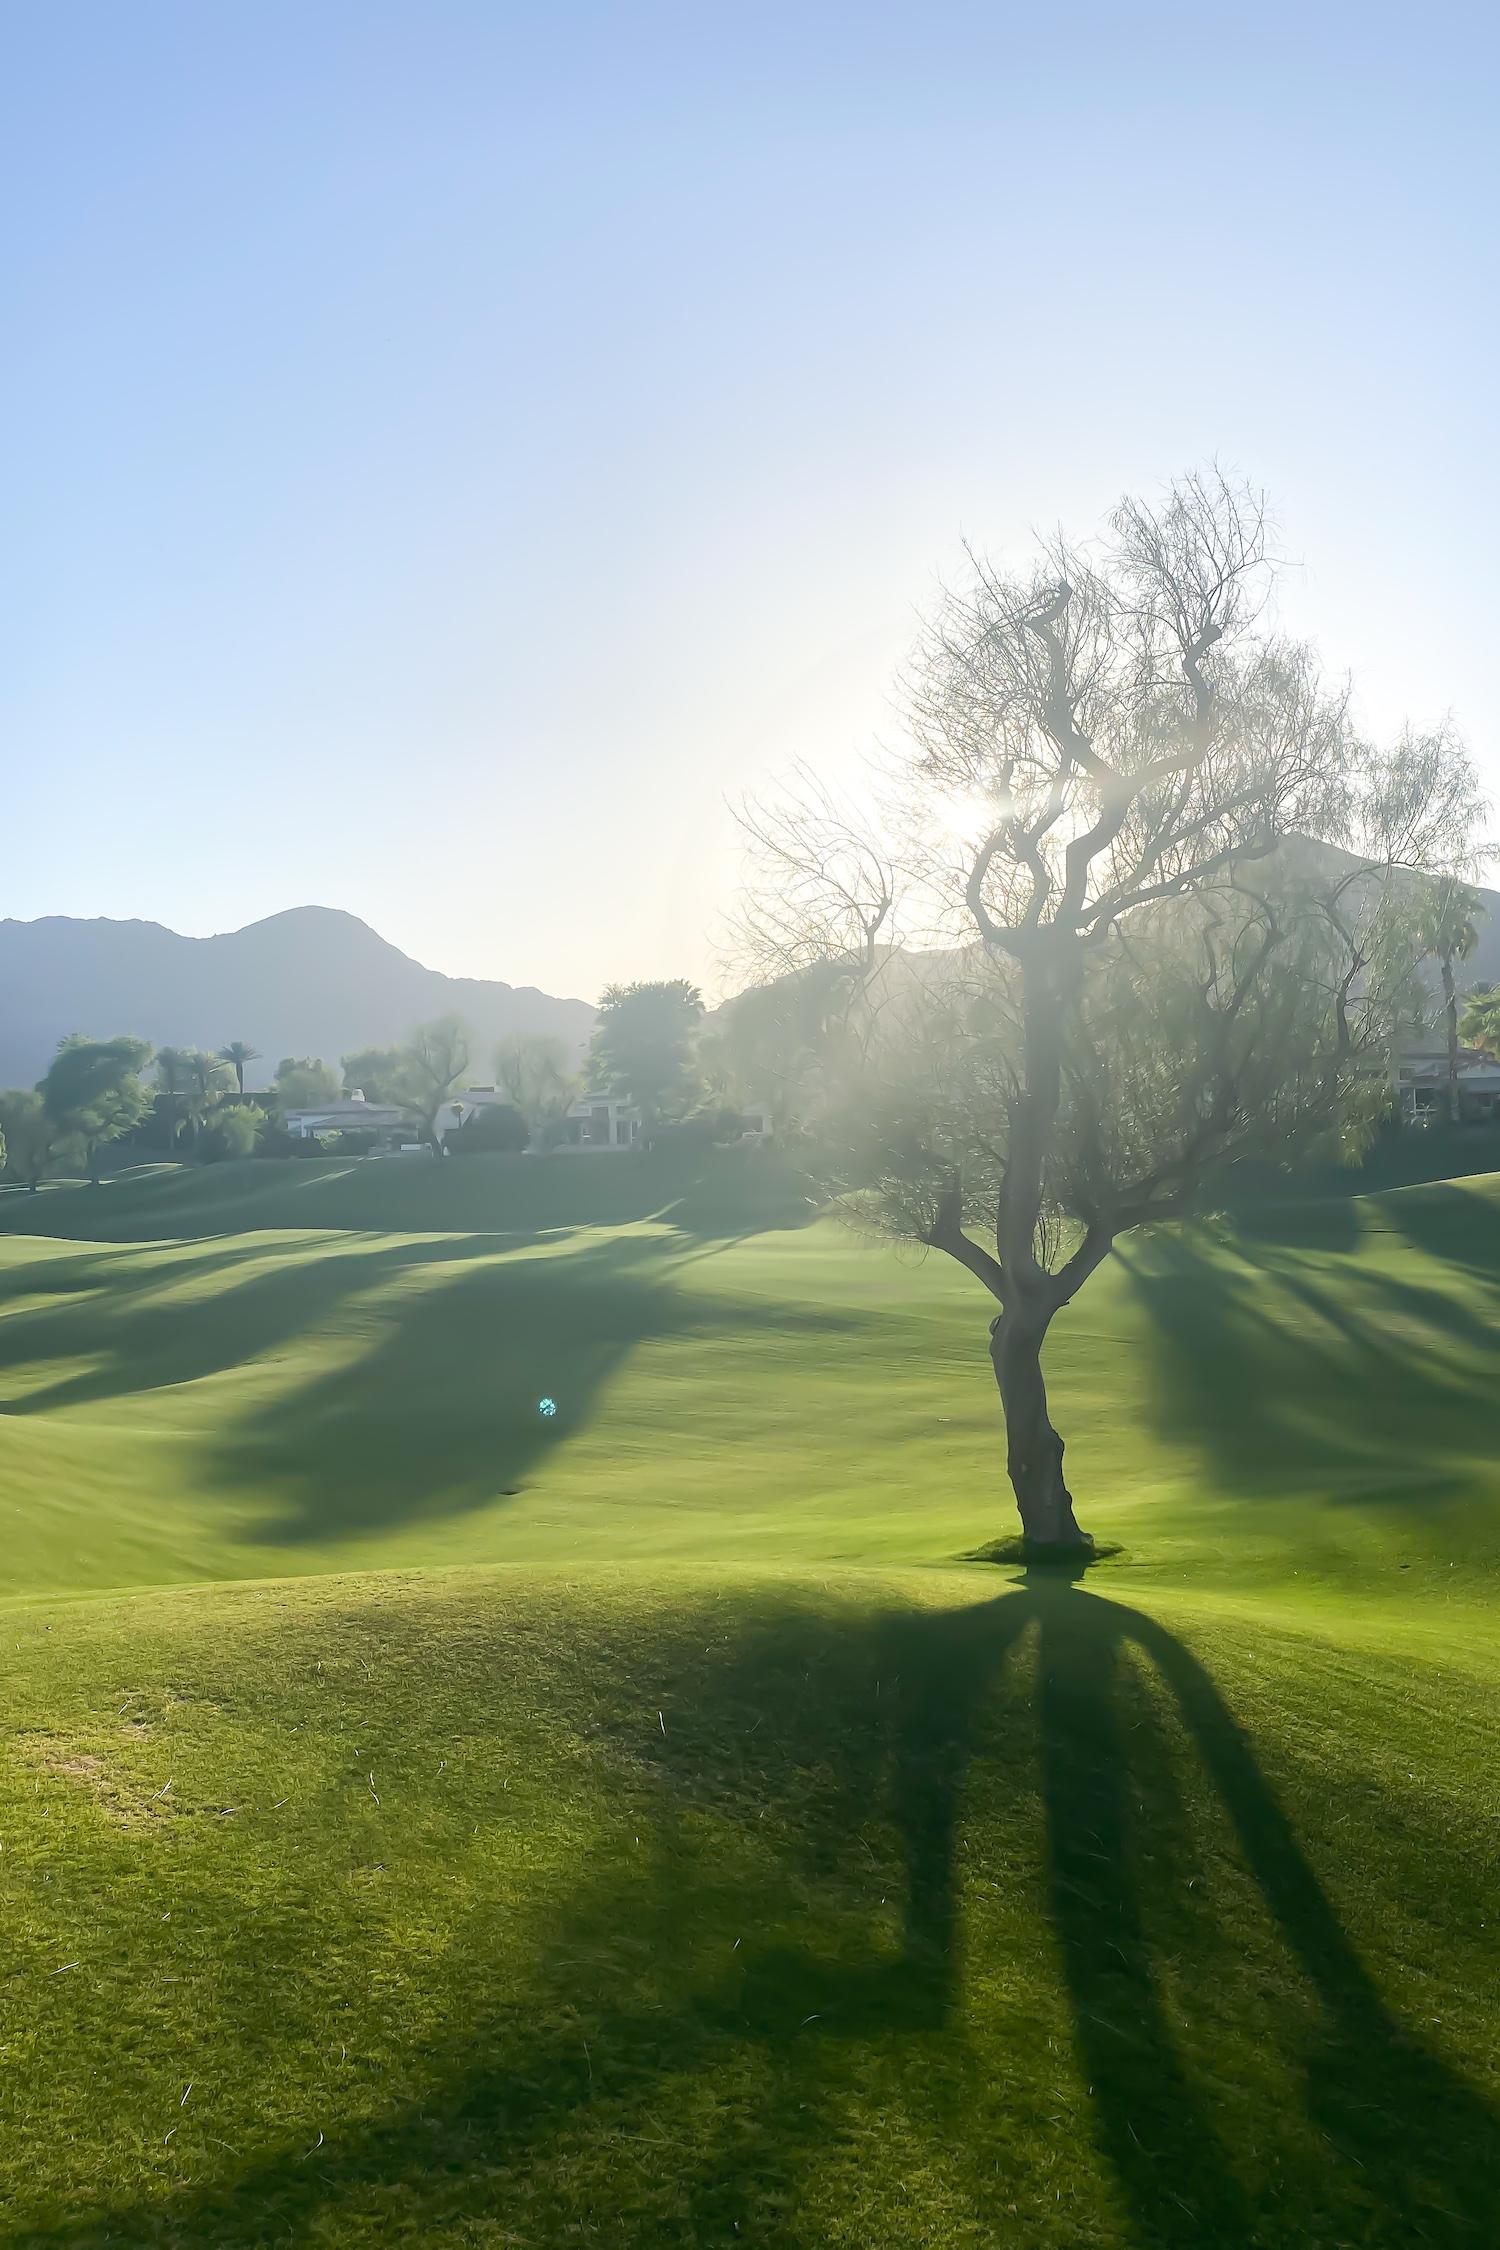 La Quinta + Palm Springs travel